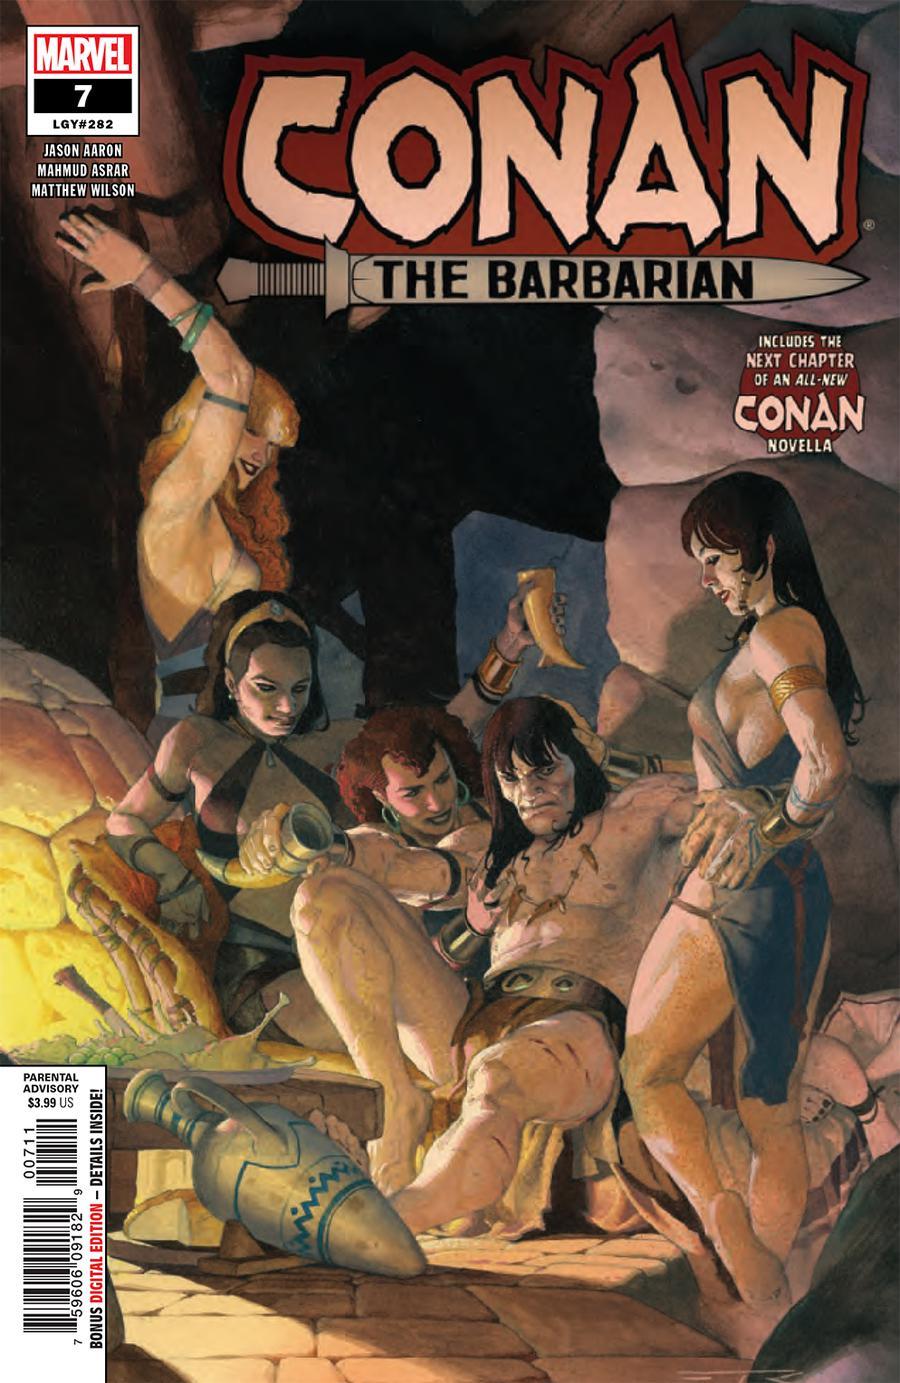 Conan The Barbarian Vol 4 #7 Cover A Regular Esad Ribic Cover